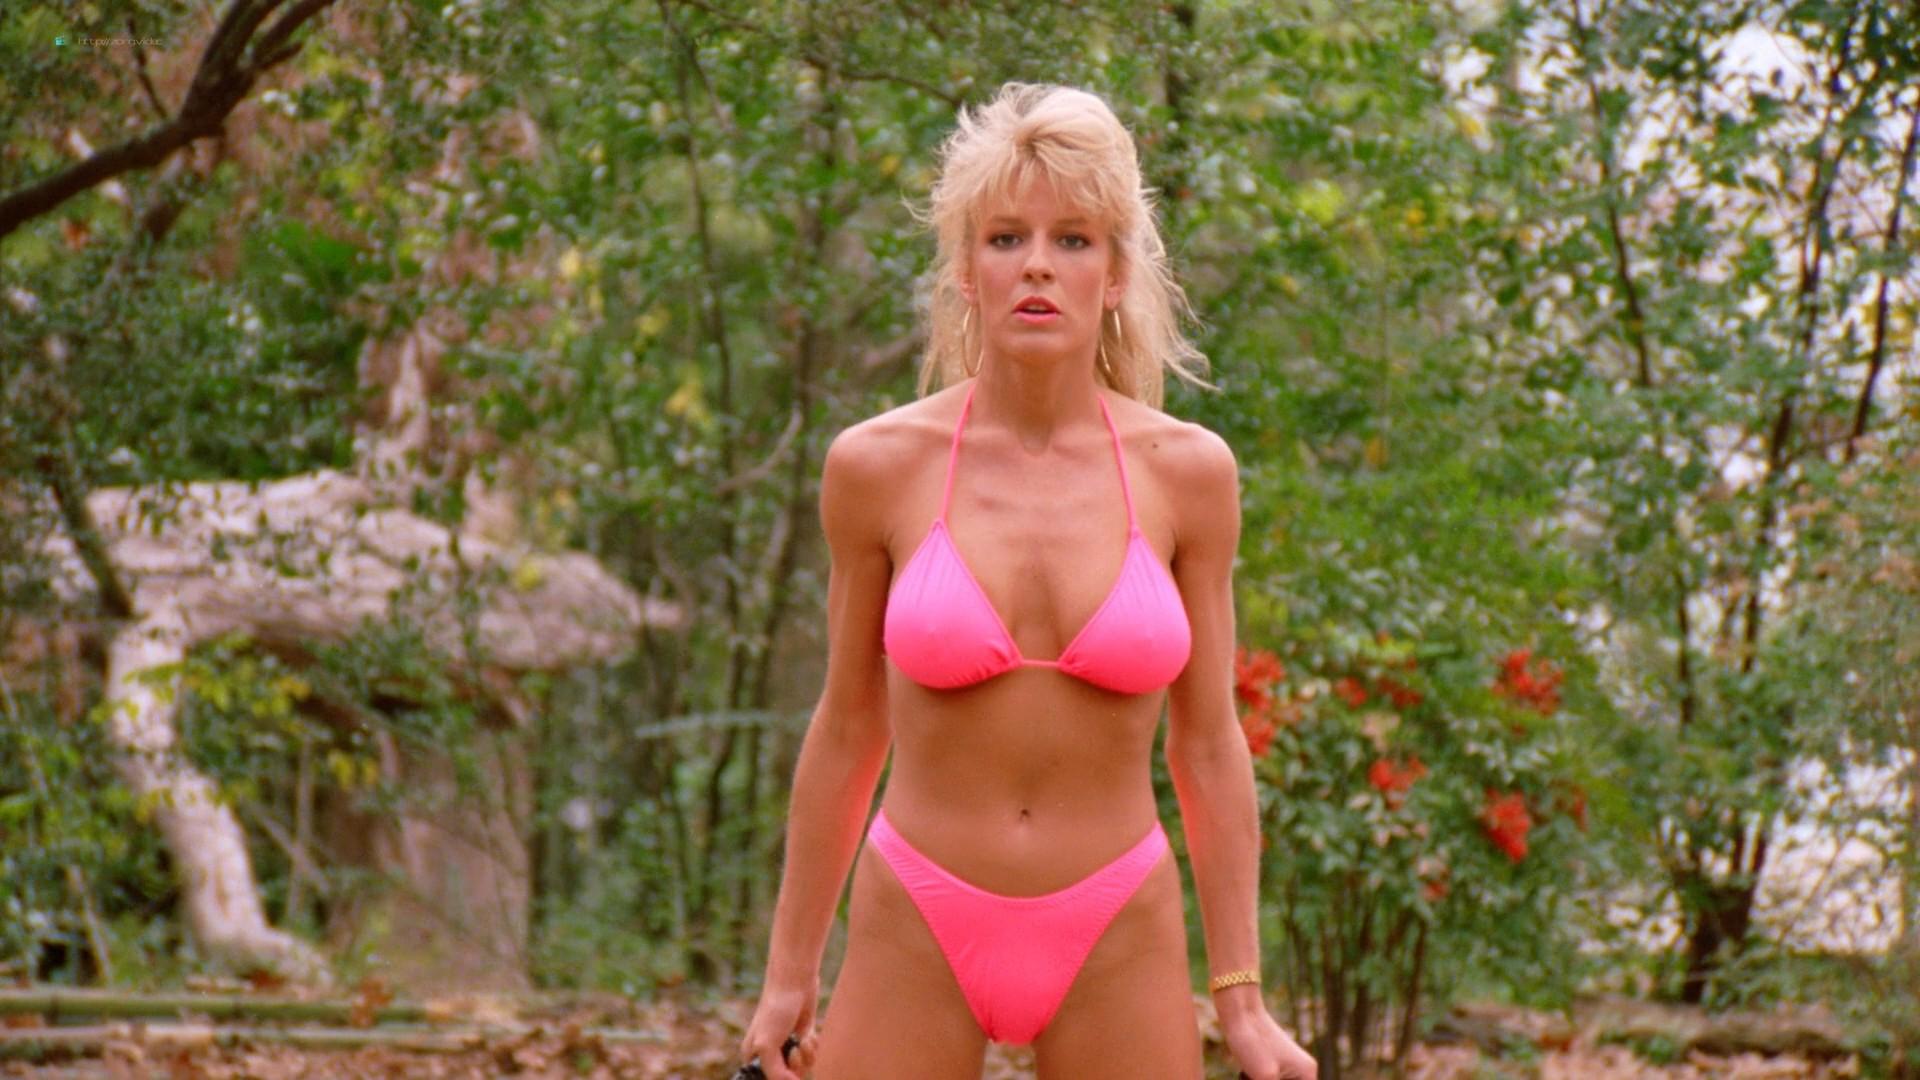 Dona Speir nude Pandora Peaks, Carolyn Liu and others nude too - Do or Die (1991) 1080p BluRay (10)